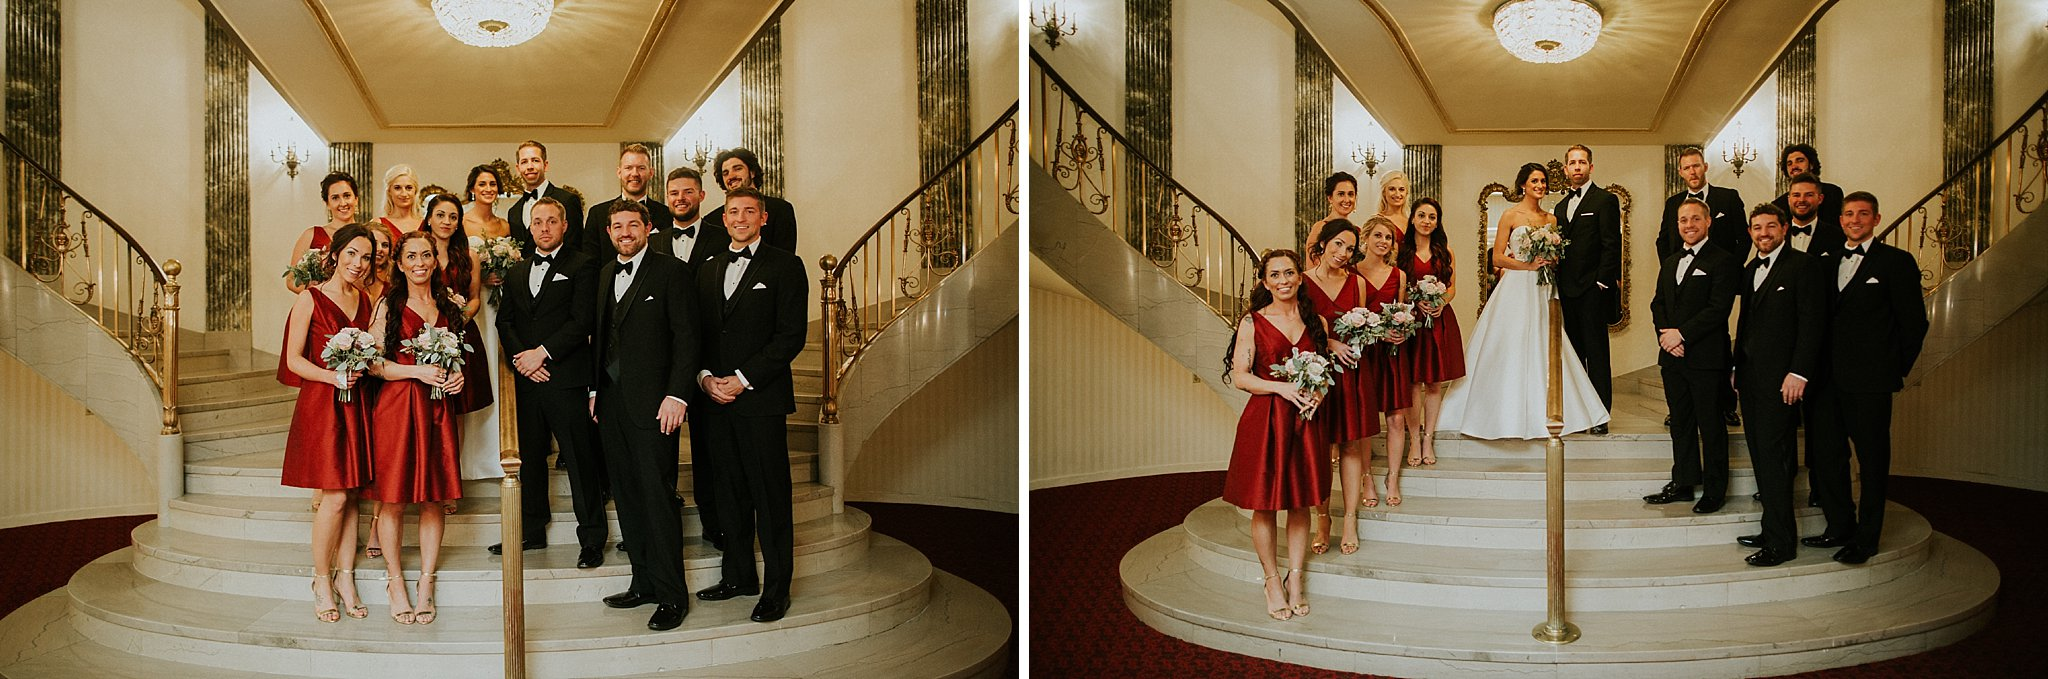 Matt-Lauren_St-Marys_Hilton-City-Center-Milwaukee-Wedding_liller-photo_0061.jpg